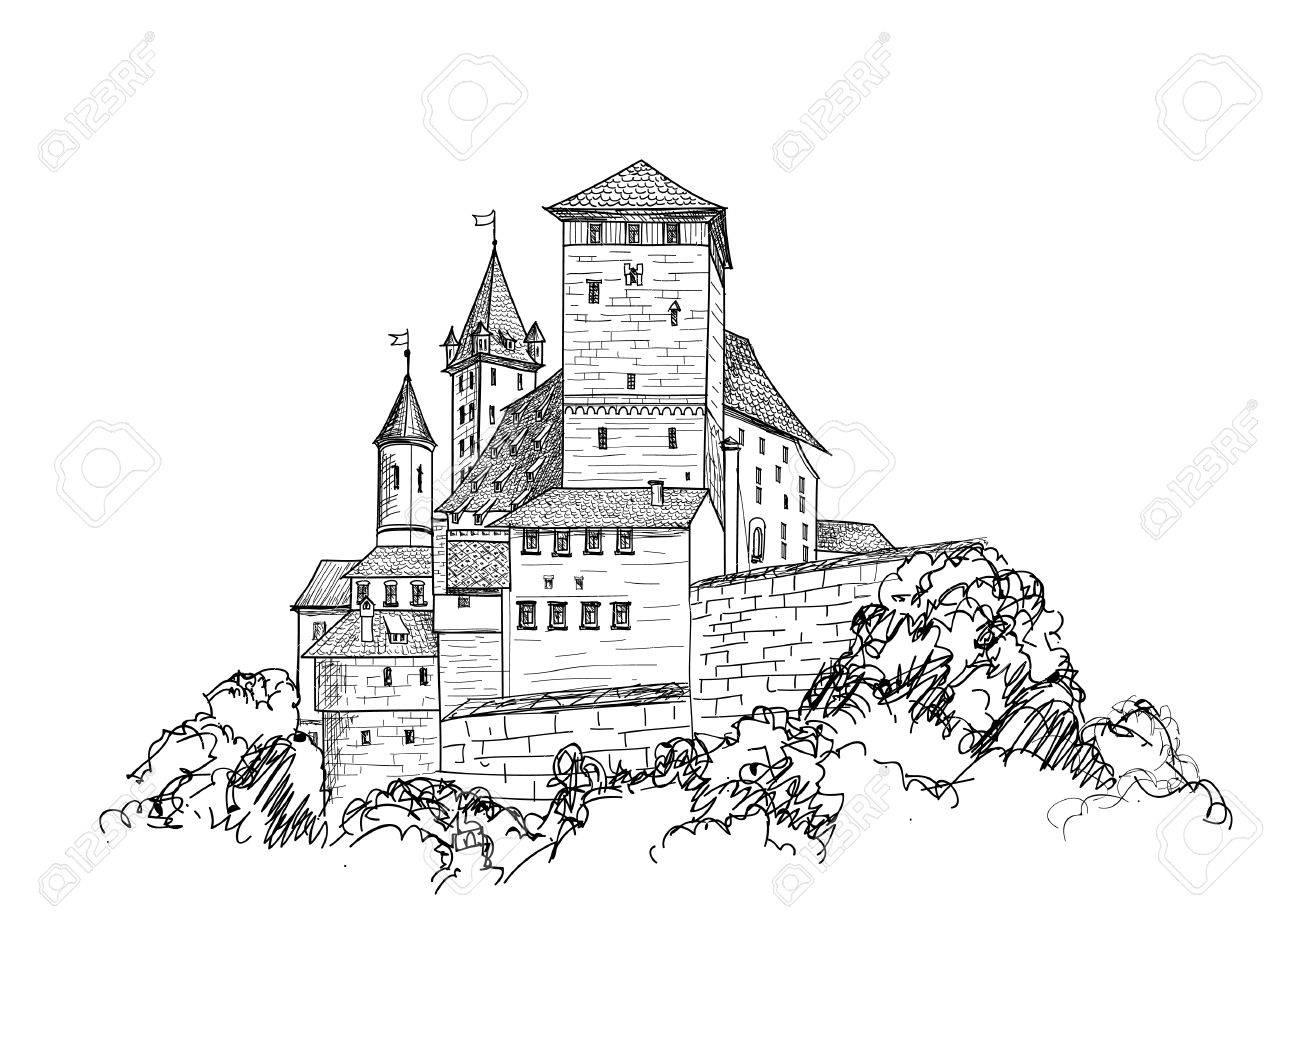 1300x1052 Ancient Castle Landscape Engraving. Tower Building Sketch Skyline